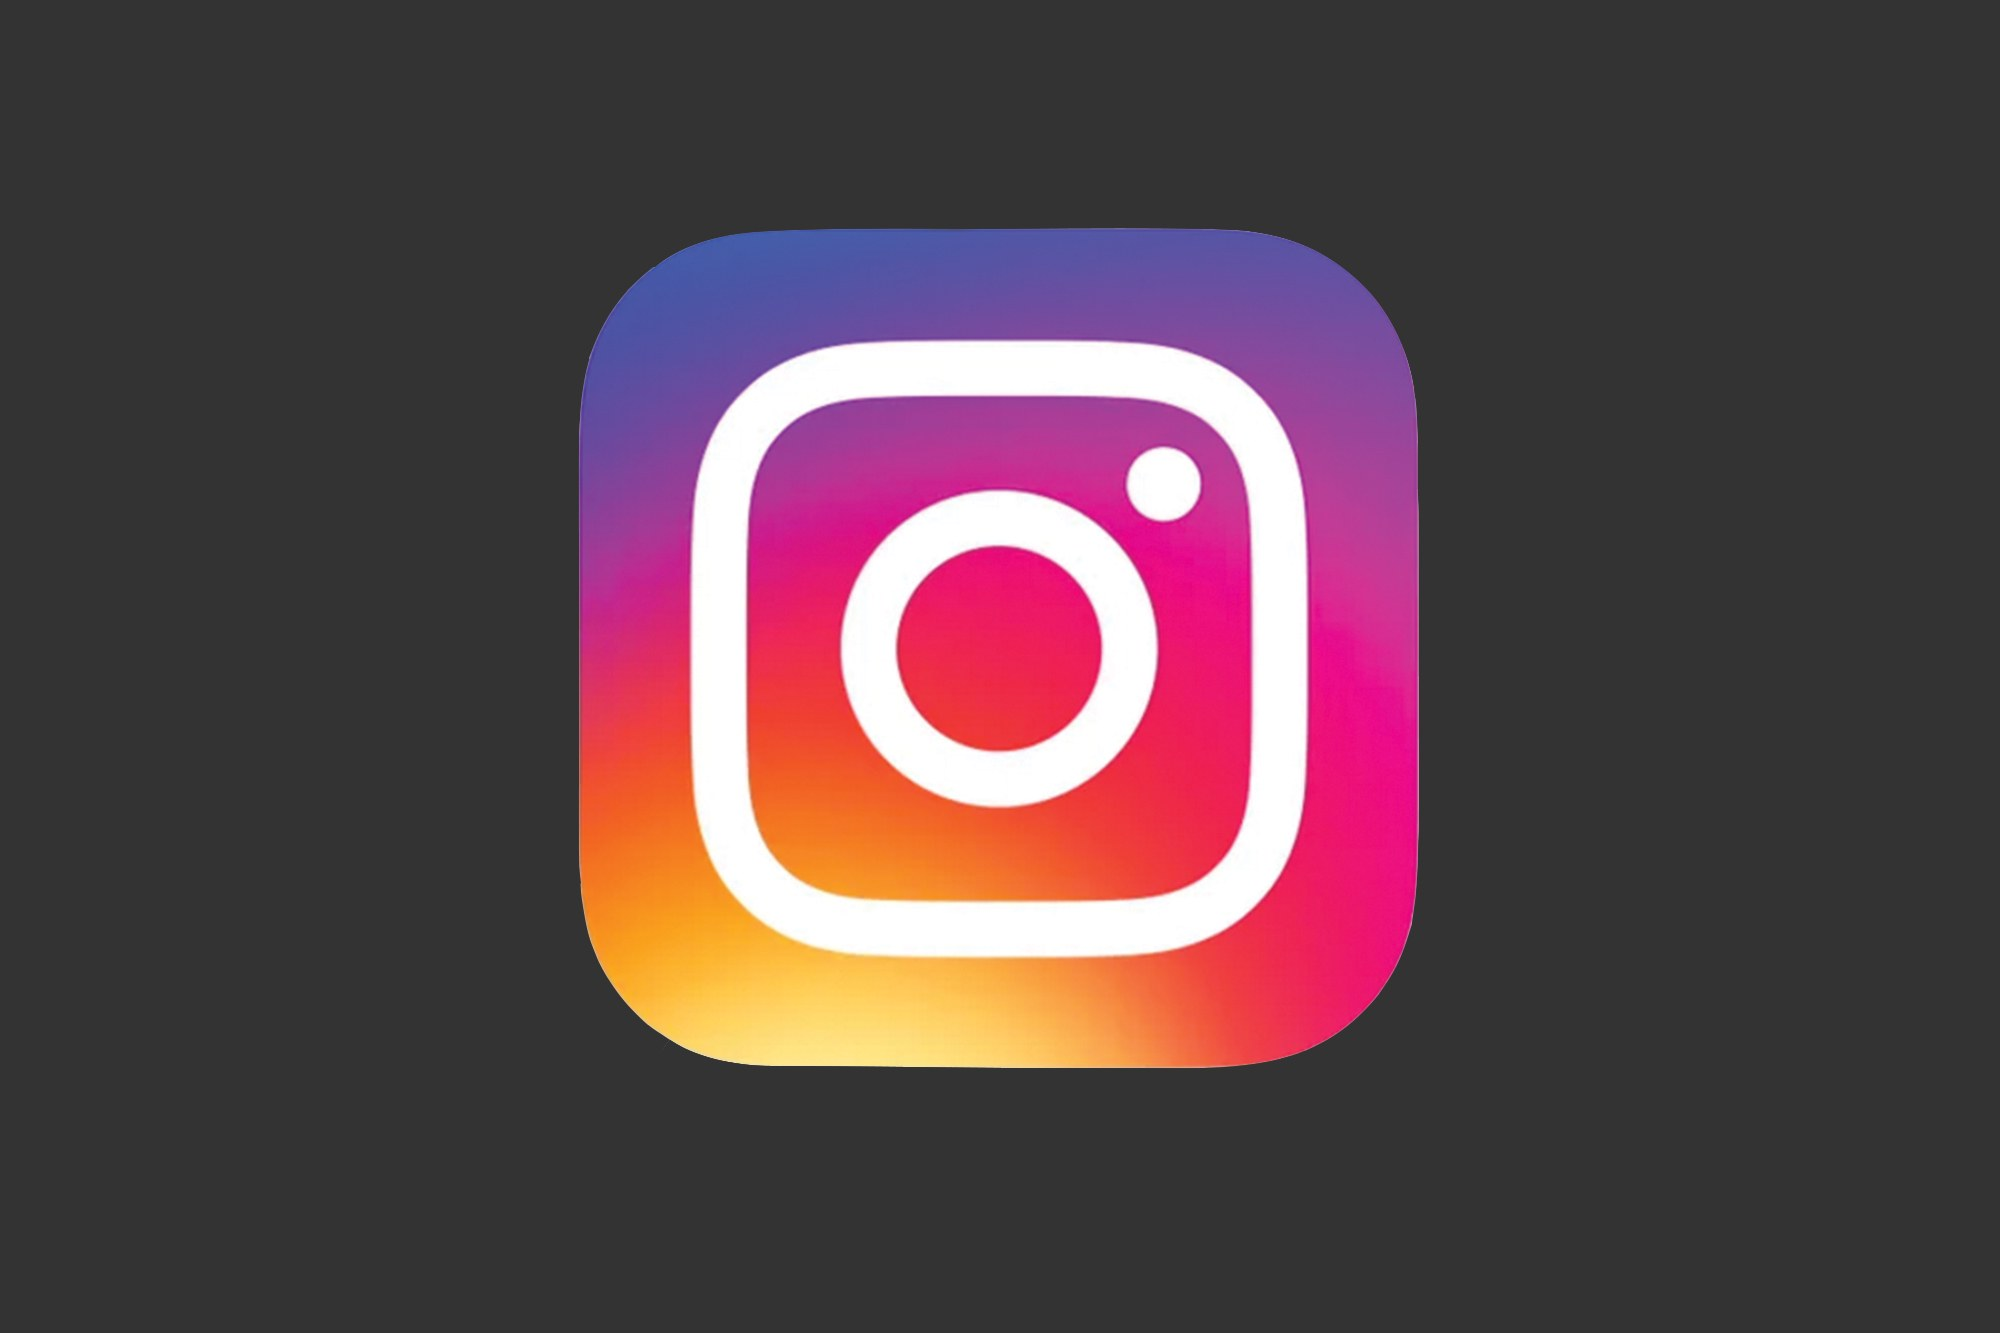 Instagram Introduces App Payments Feature | Newslibre